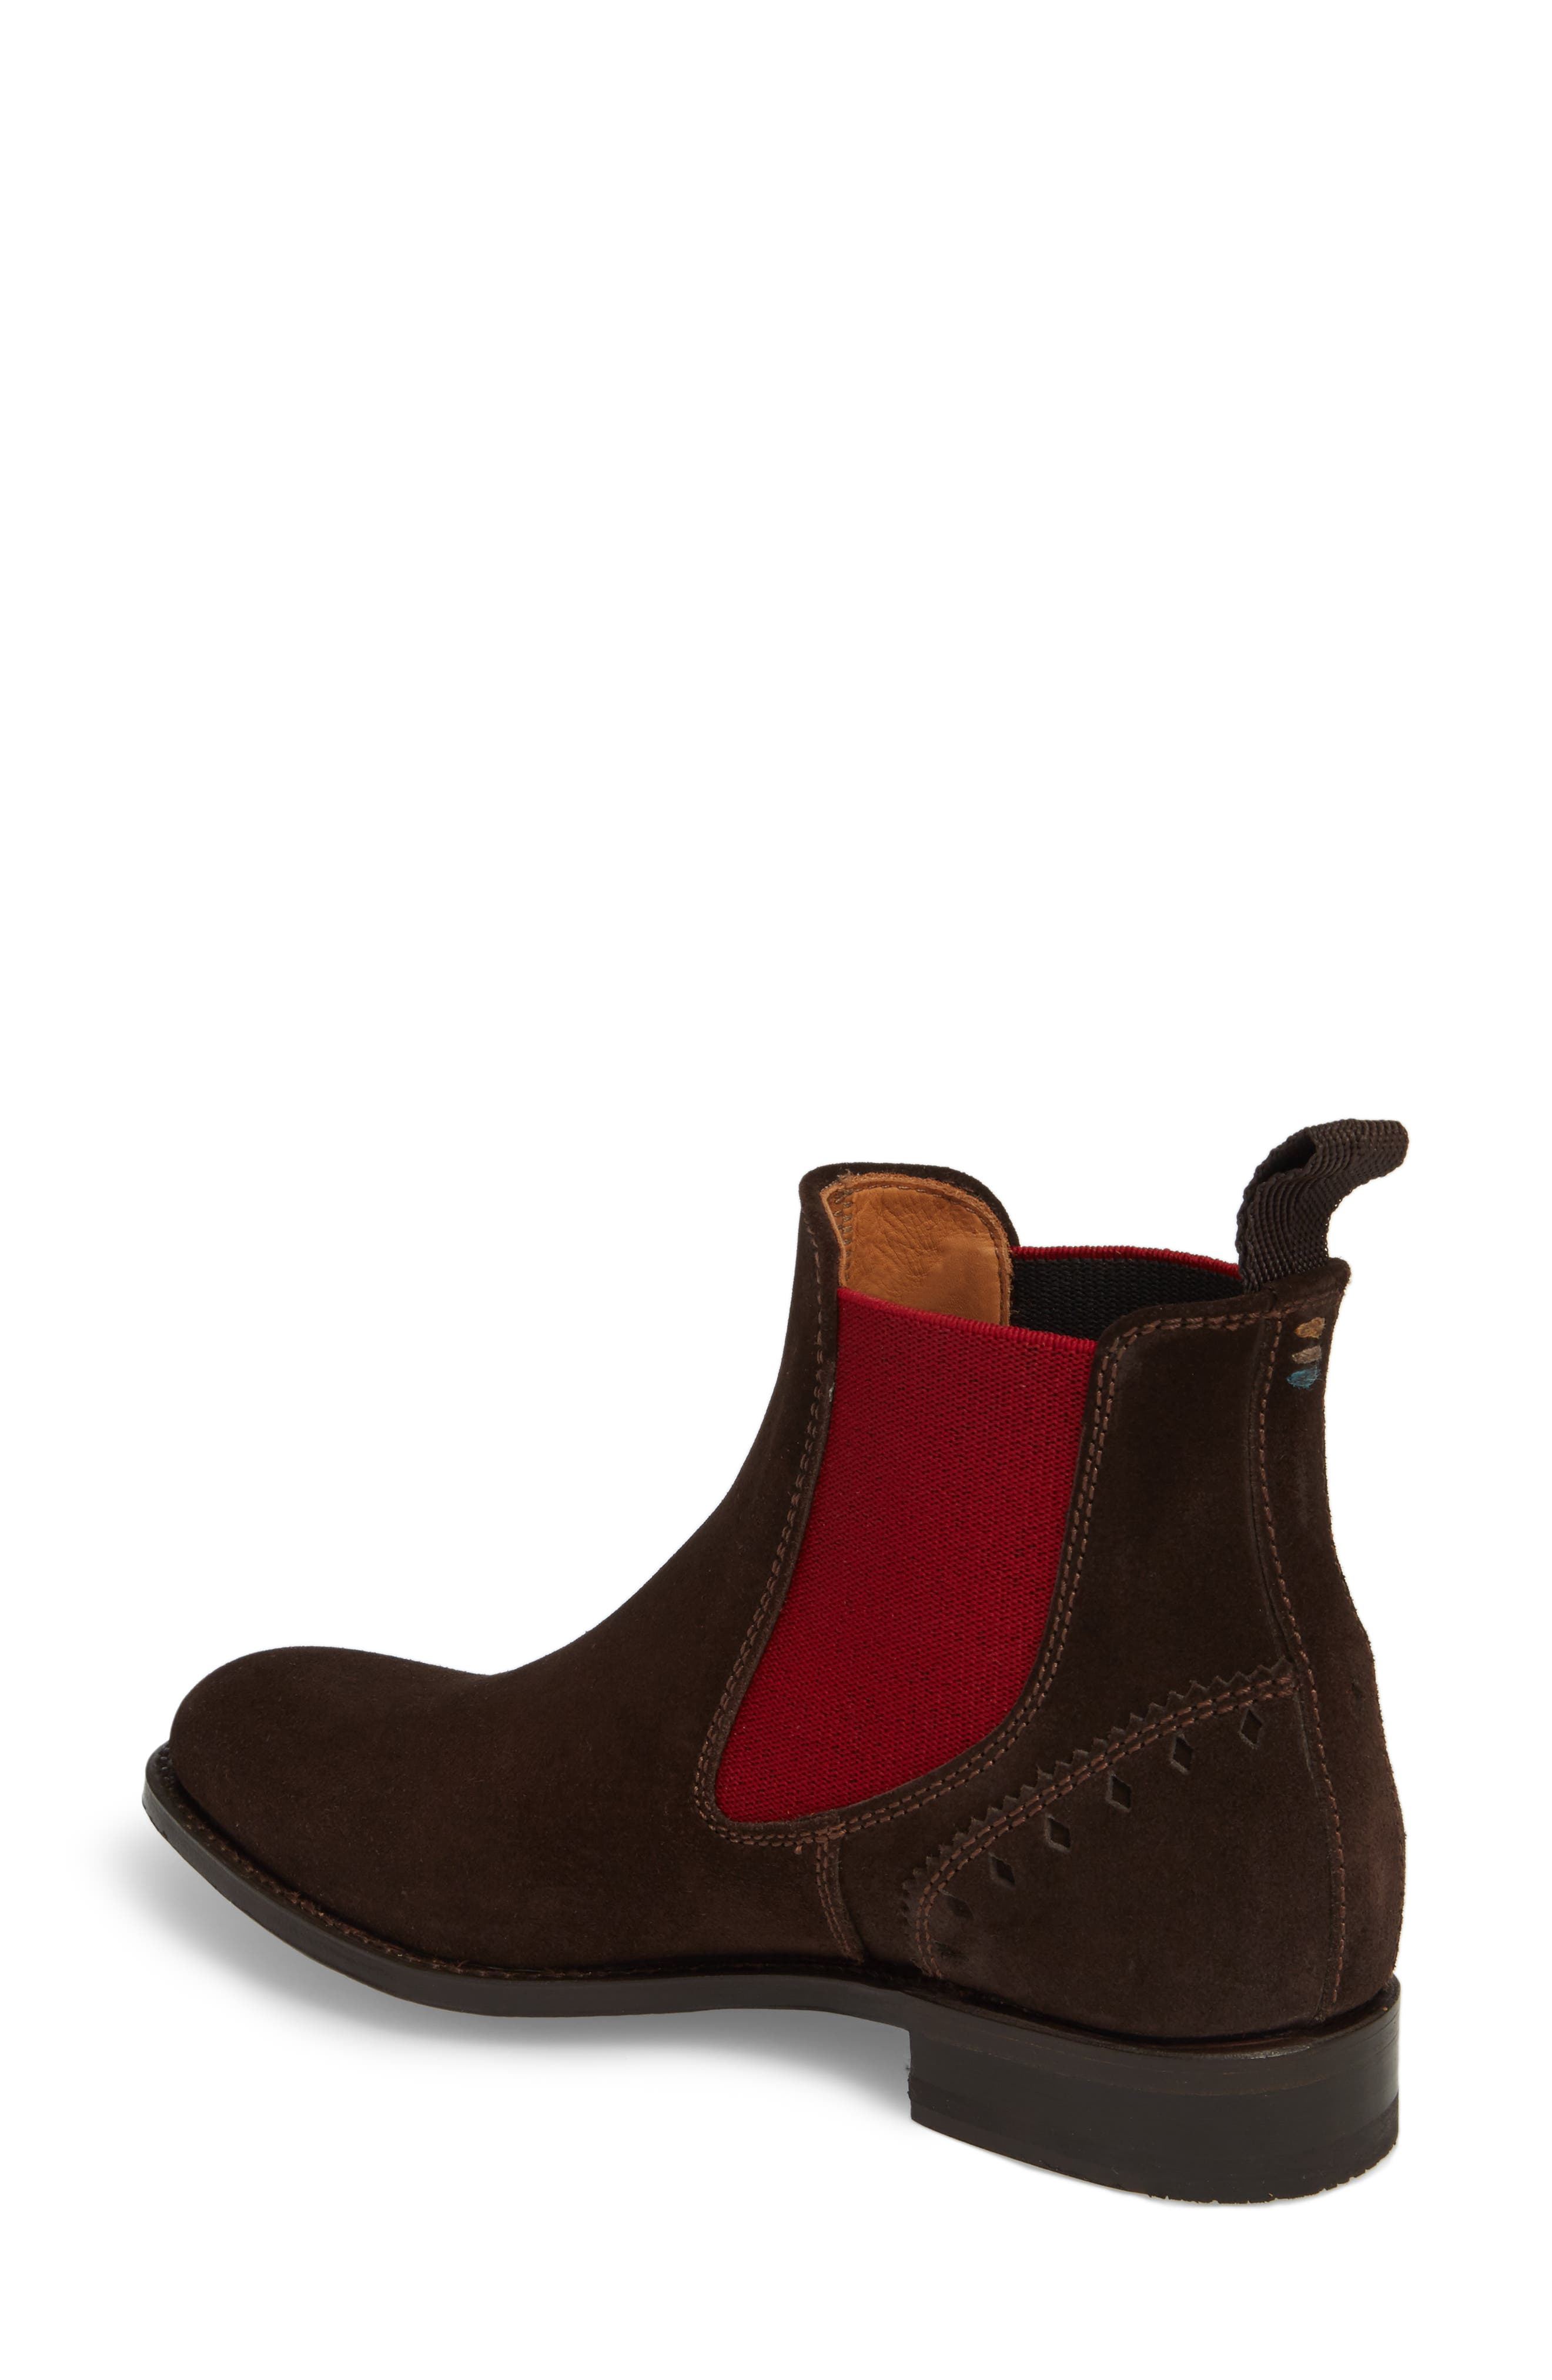 Benissa Lux Chelsea Boot,                             Alternate thumbnail 2, color,